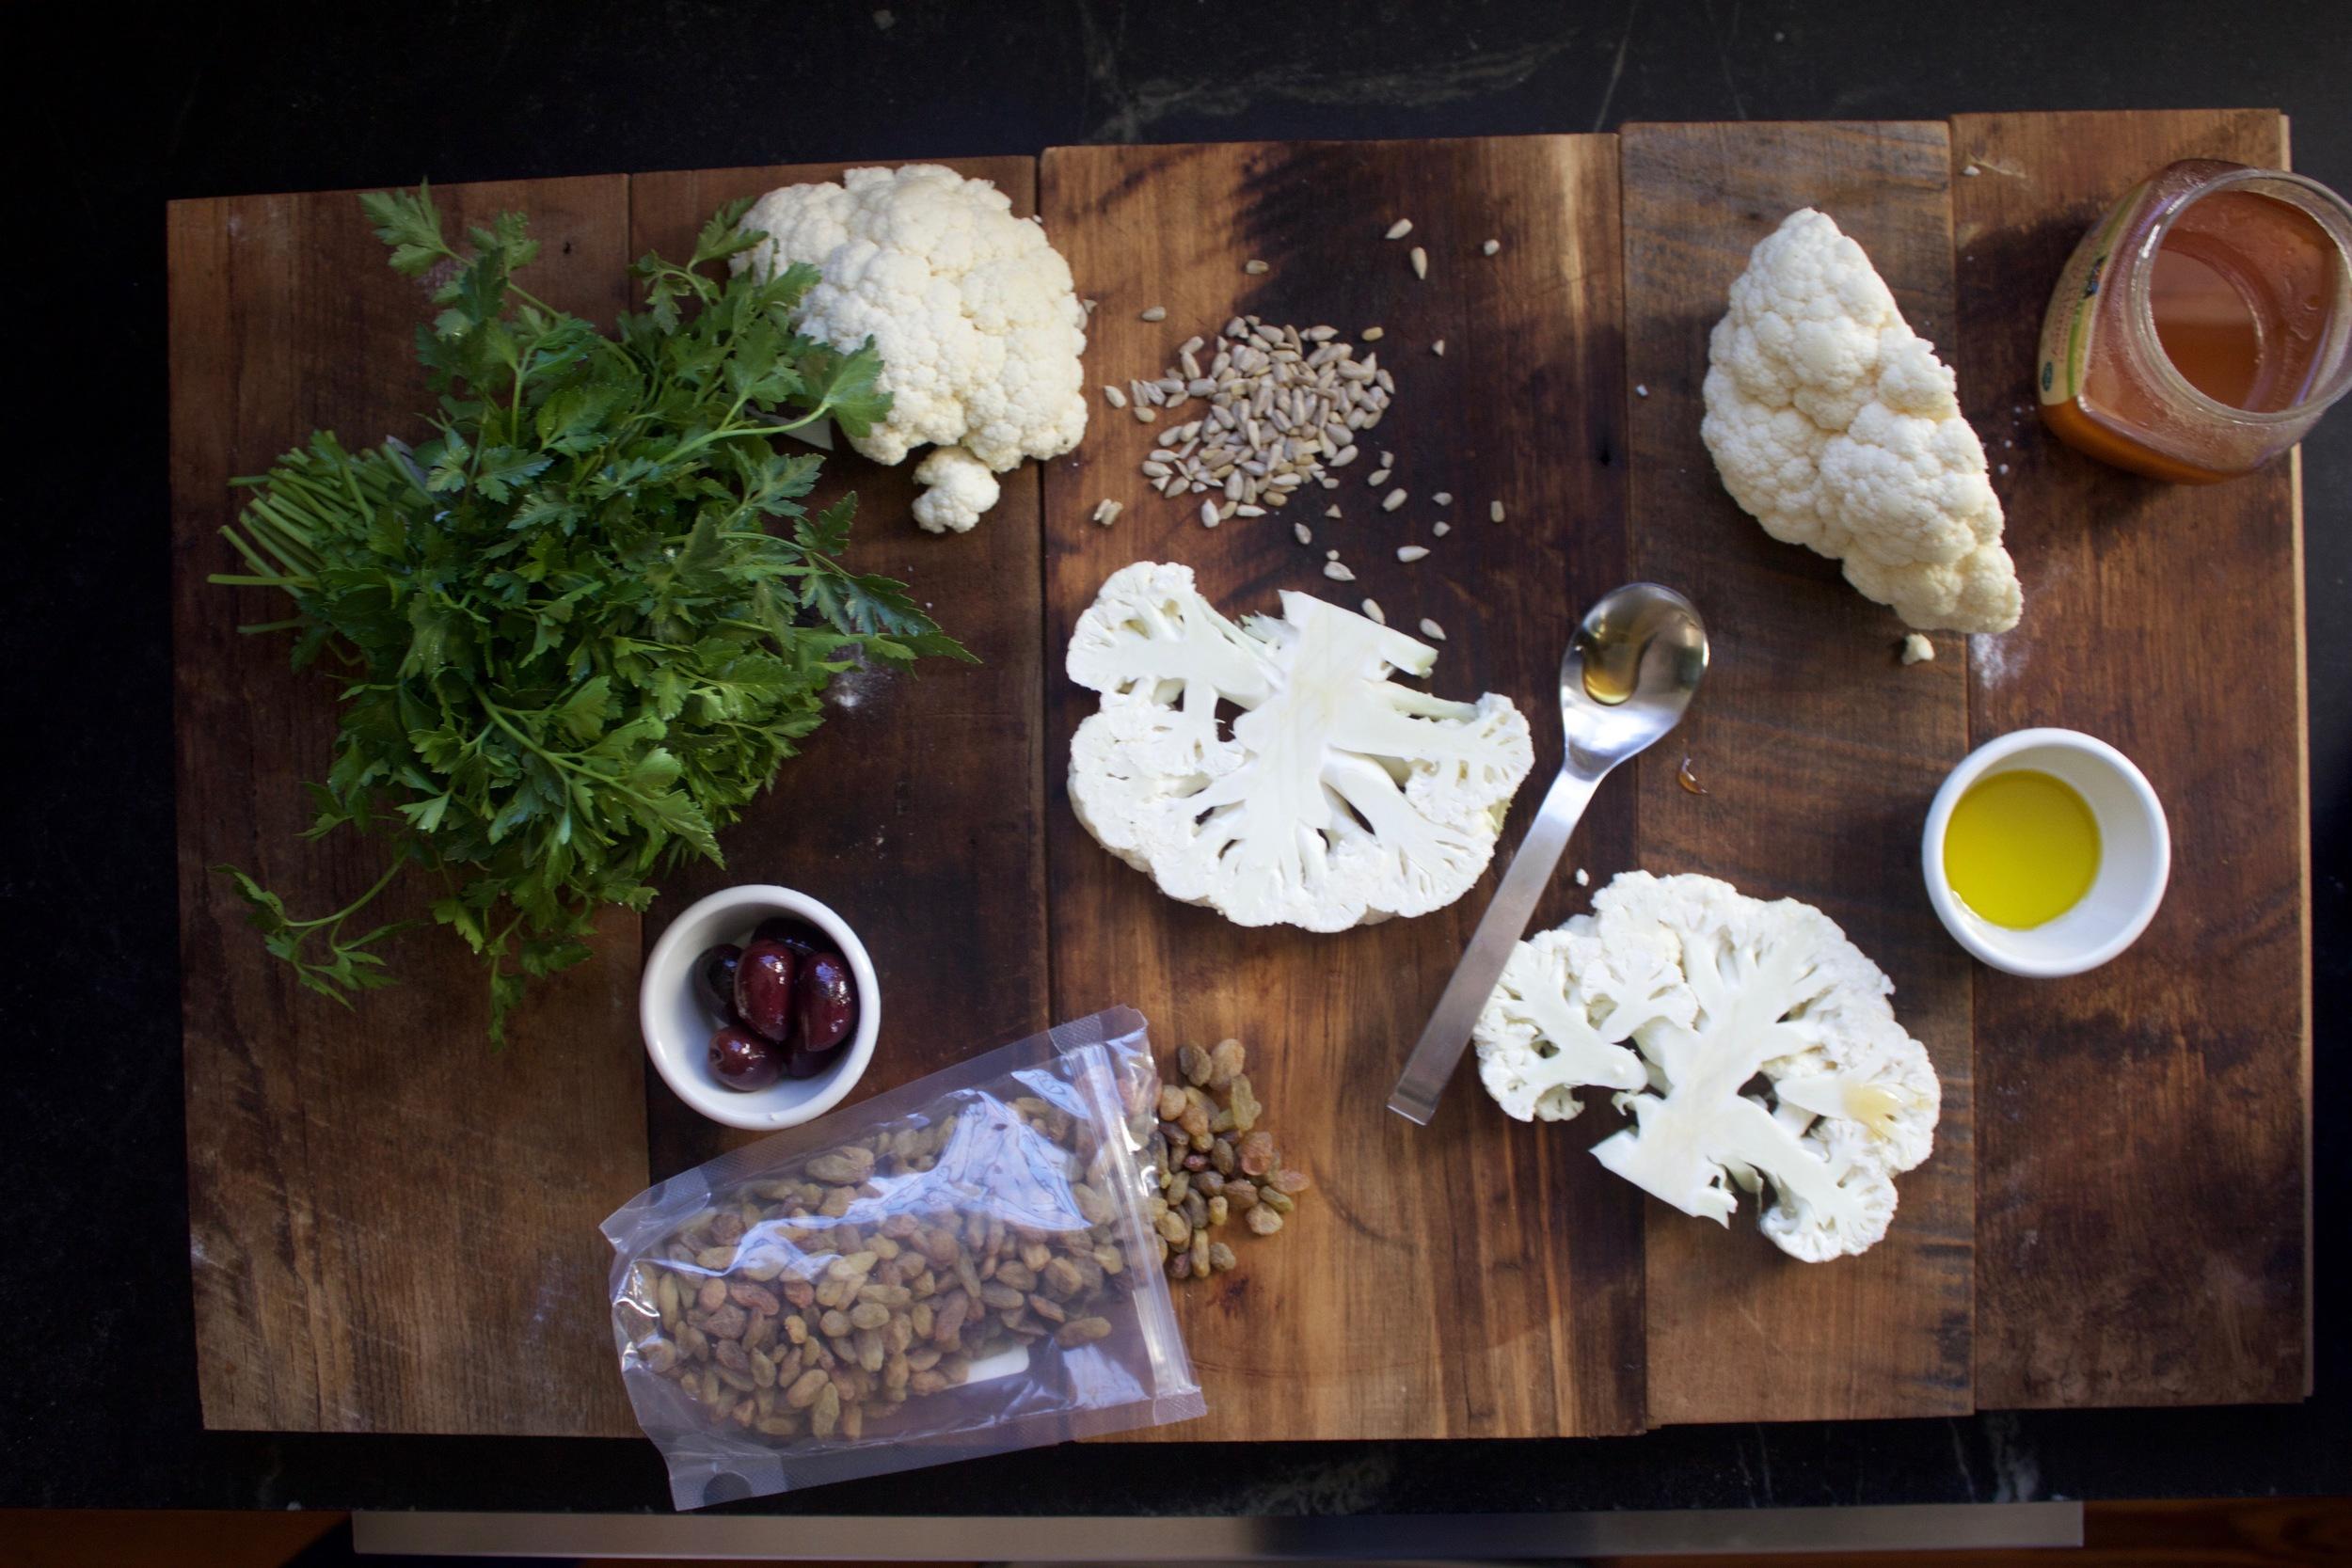 cauliflower steak mis en place